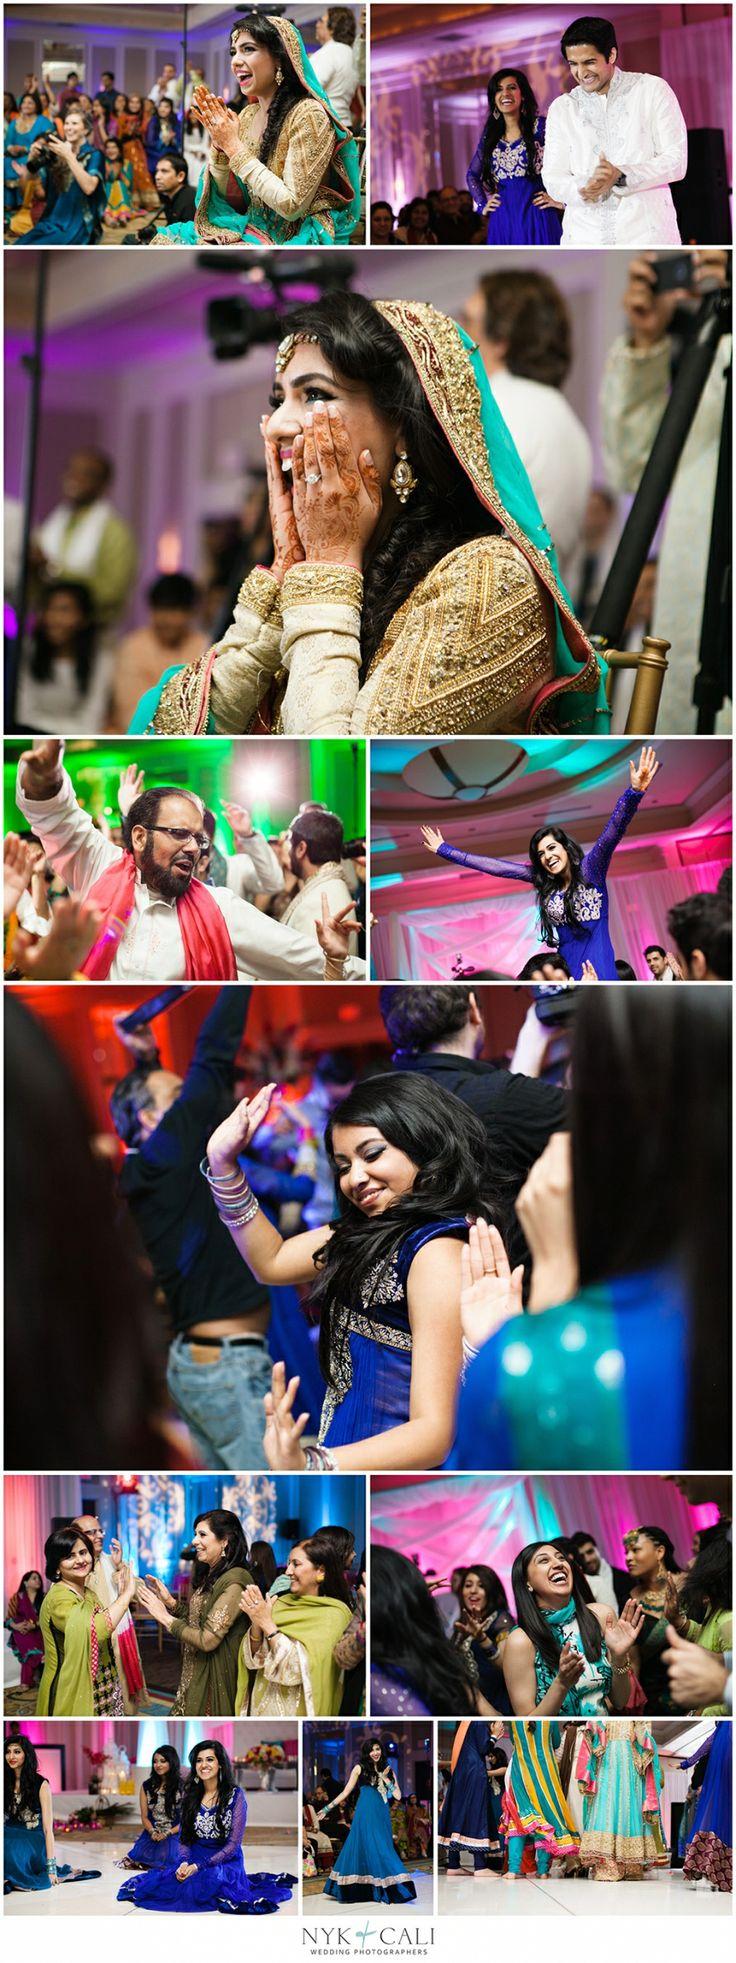 Nyk + Cali, Wedding Photographers | Nashville, TN | South Asian Wedding Photography | Pakistani | Mehndi | Celebration | Downtown Hilton Hotel | Hindu Ceremony | Creative | Dancing